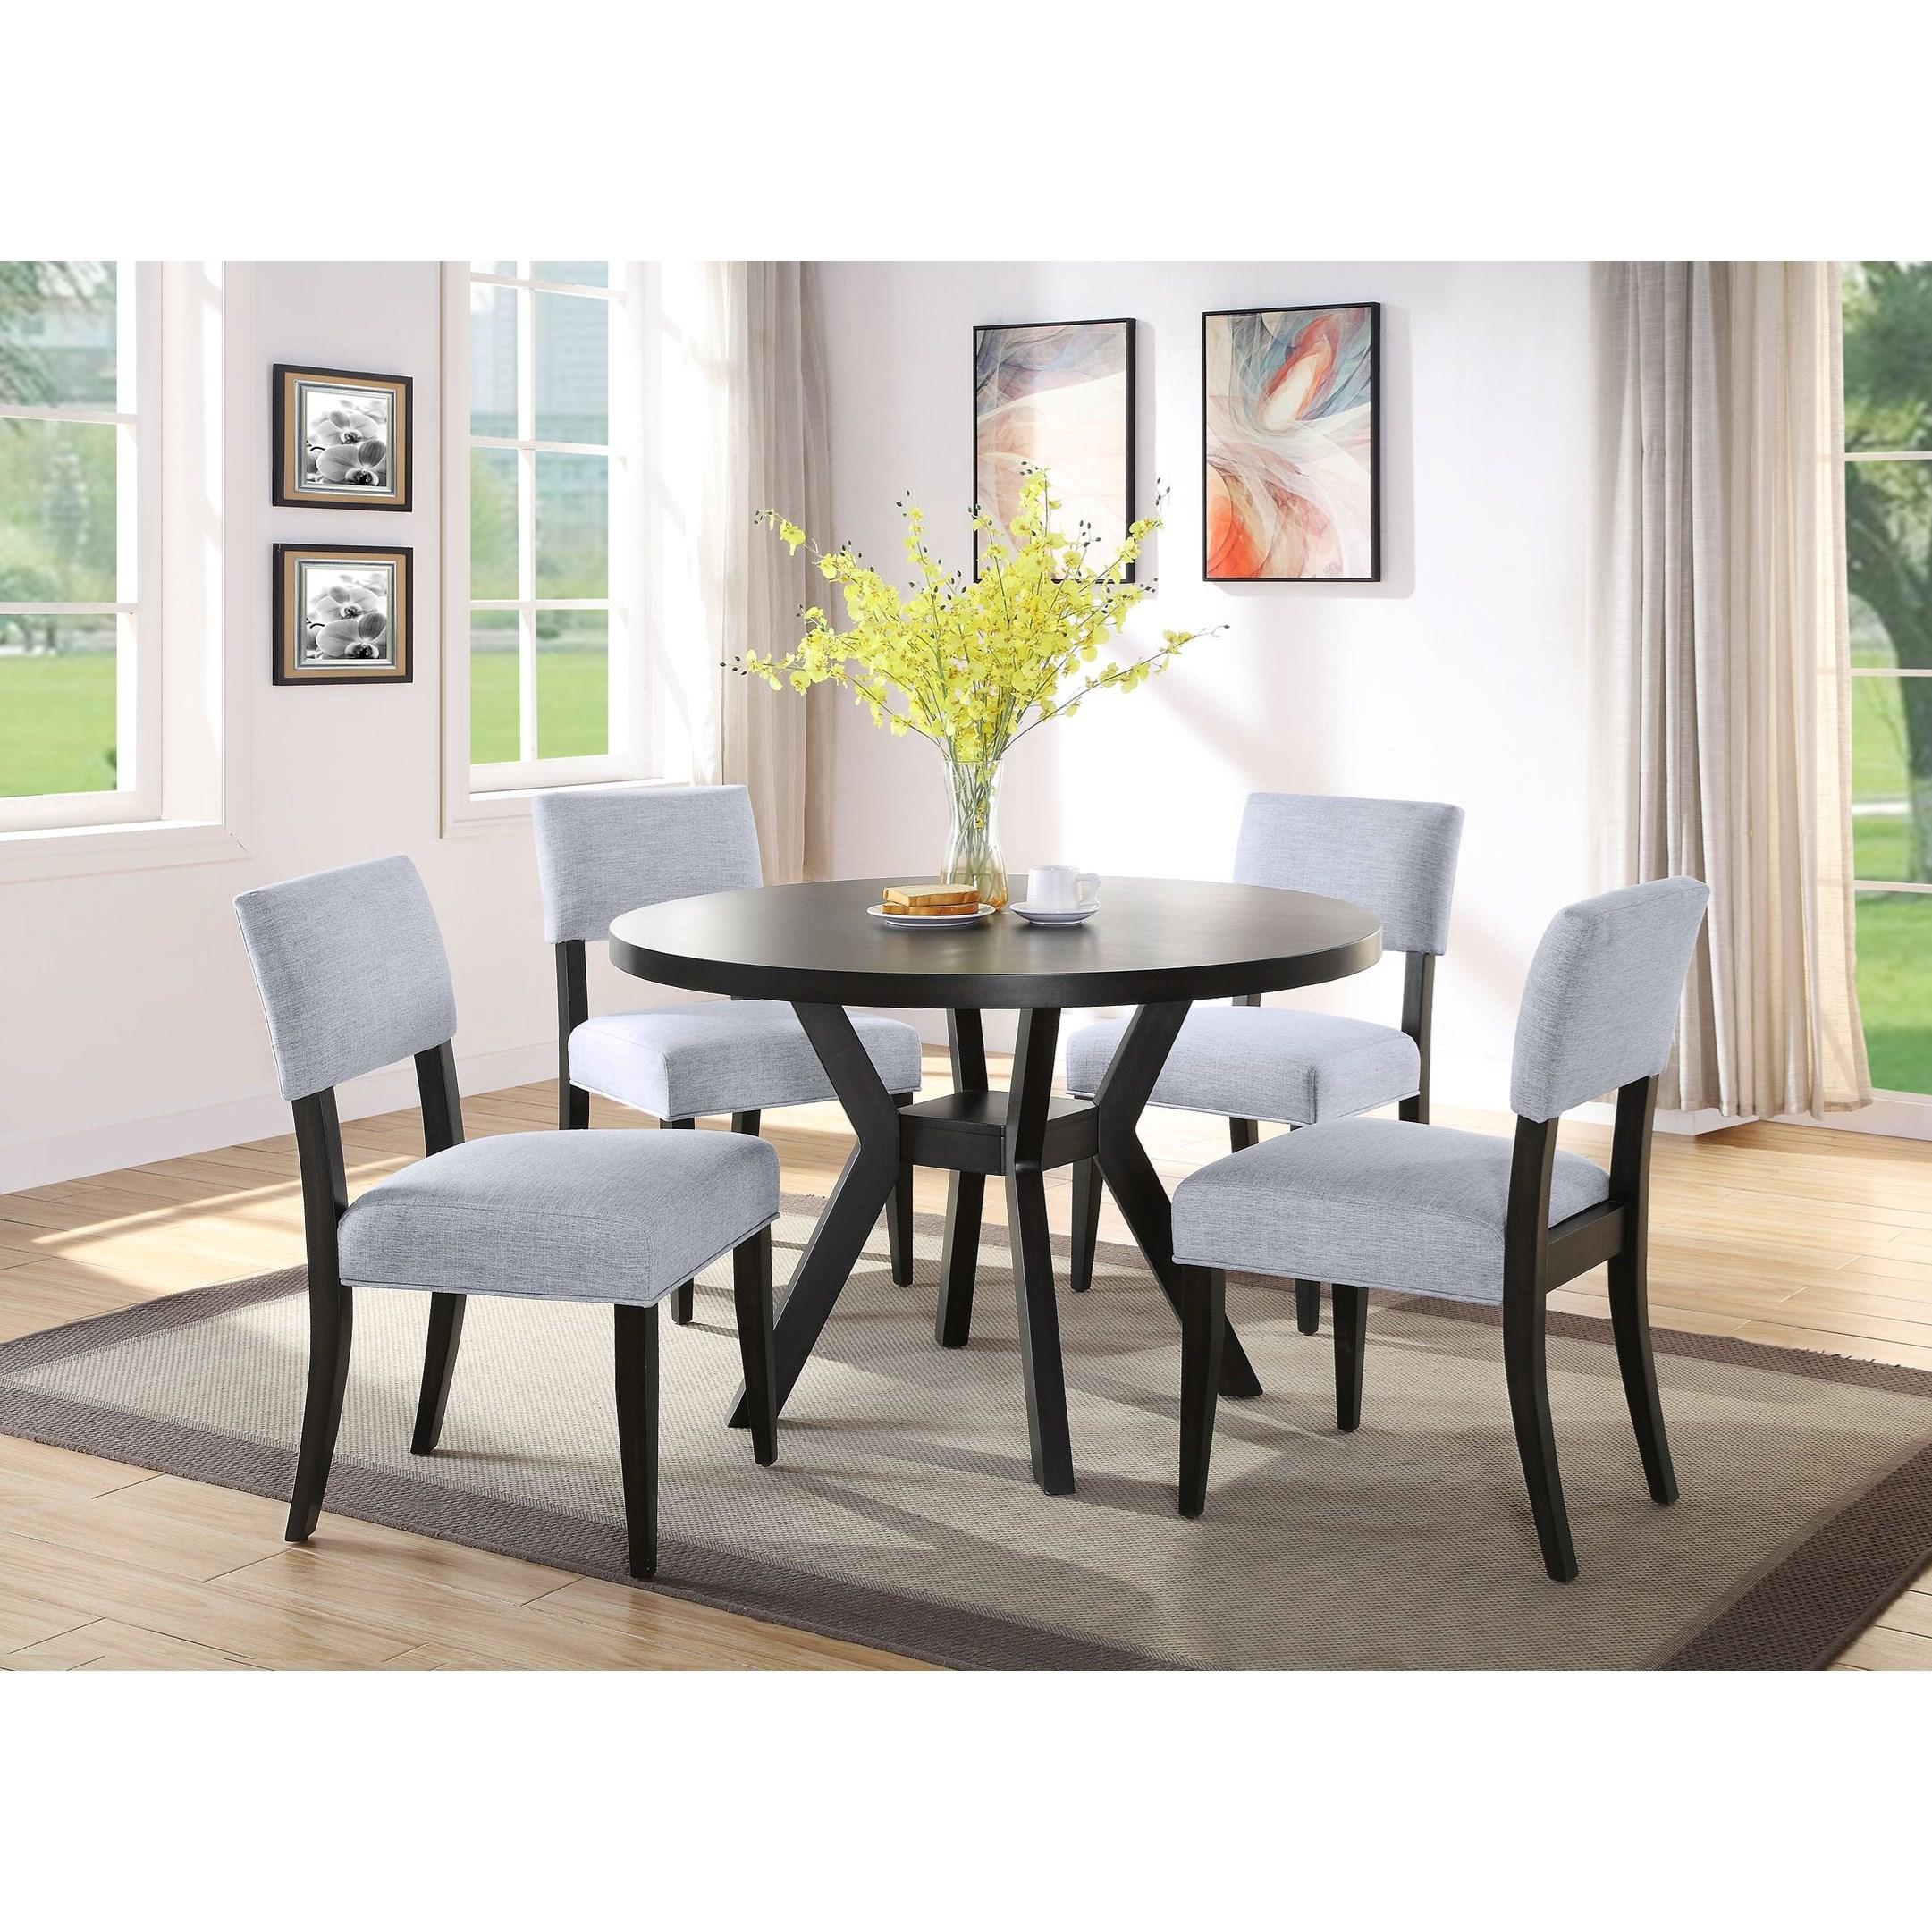 Dining Room Furniture Essentials: Belfort Essentials Maya Contemporary 5-Piece Dining Set